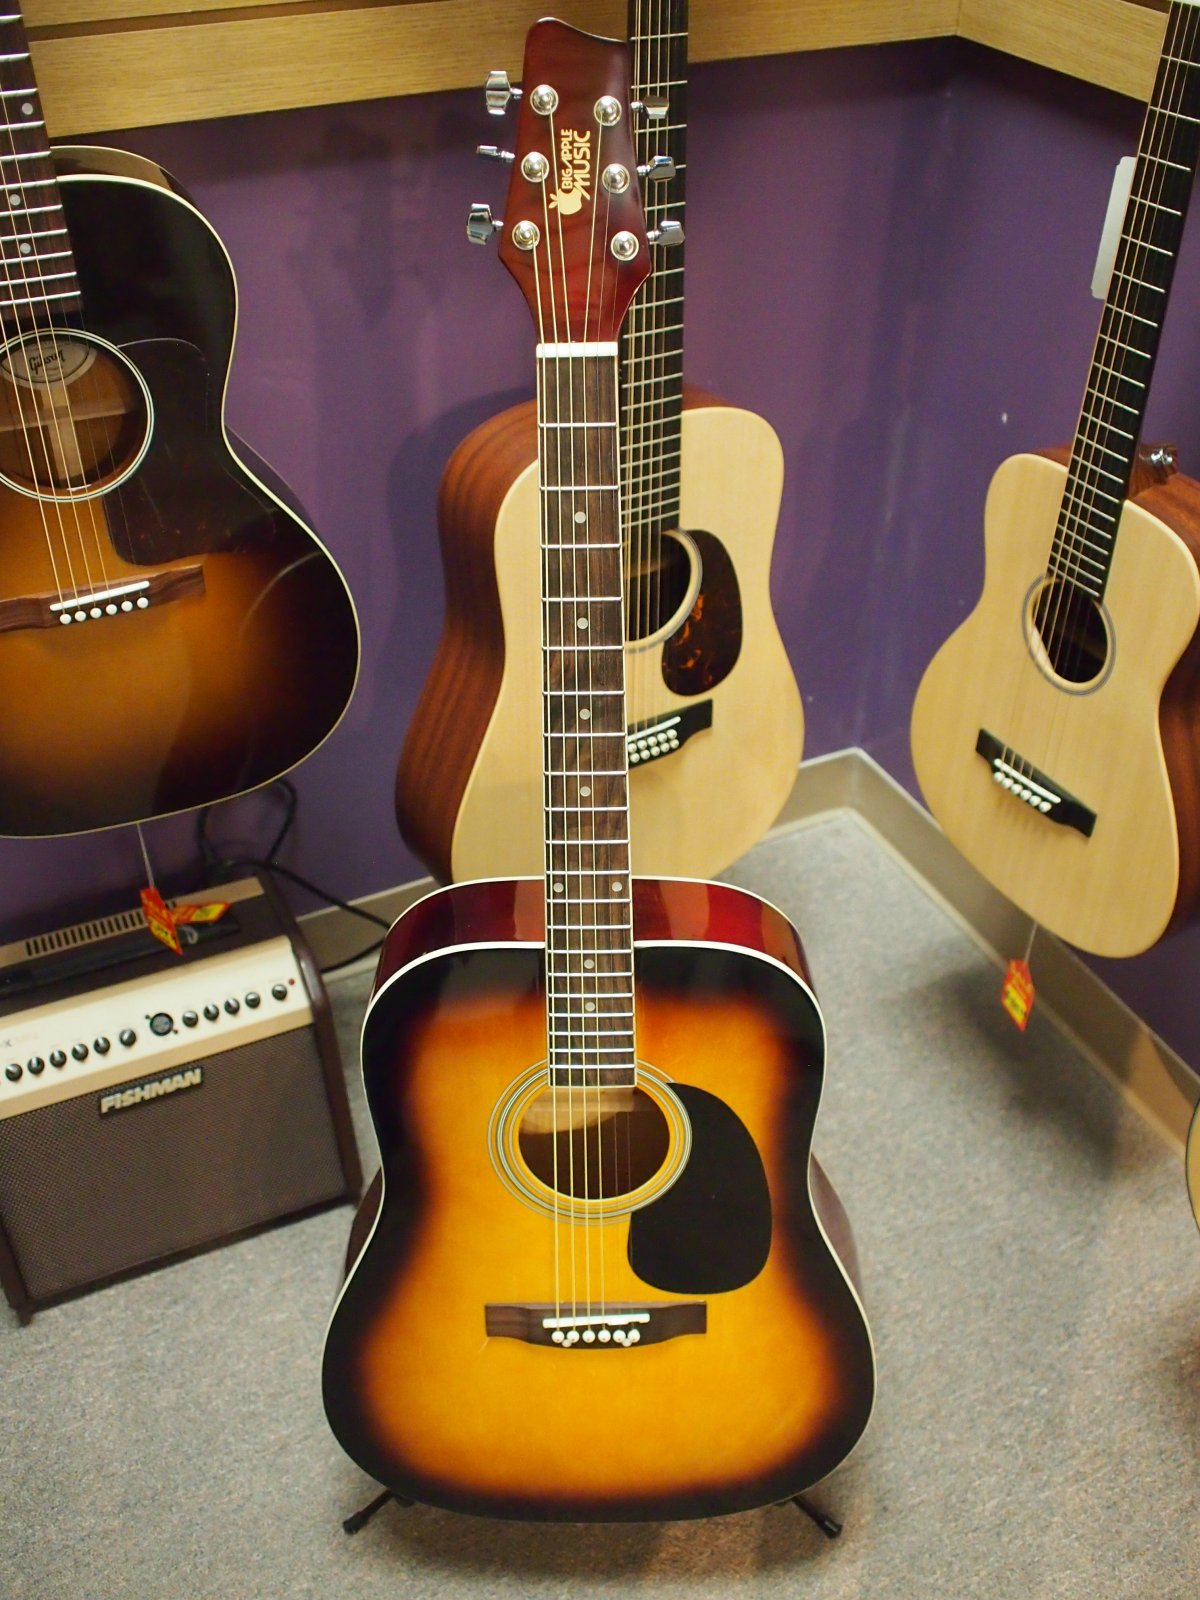 Big Apple Music Acoustic Guitar - Sunburst